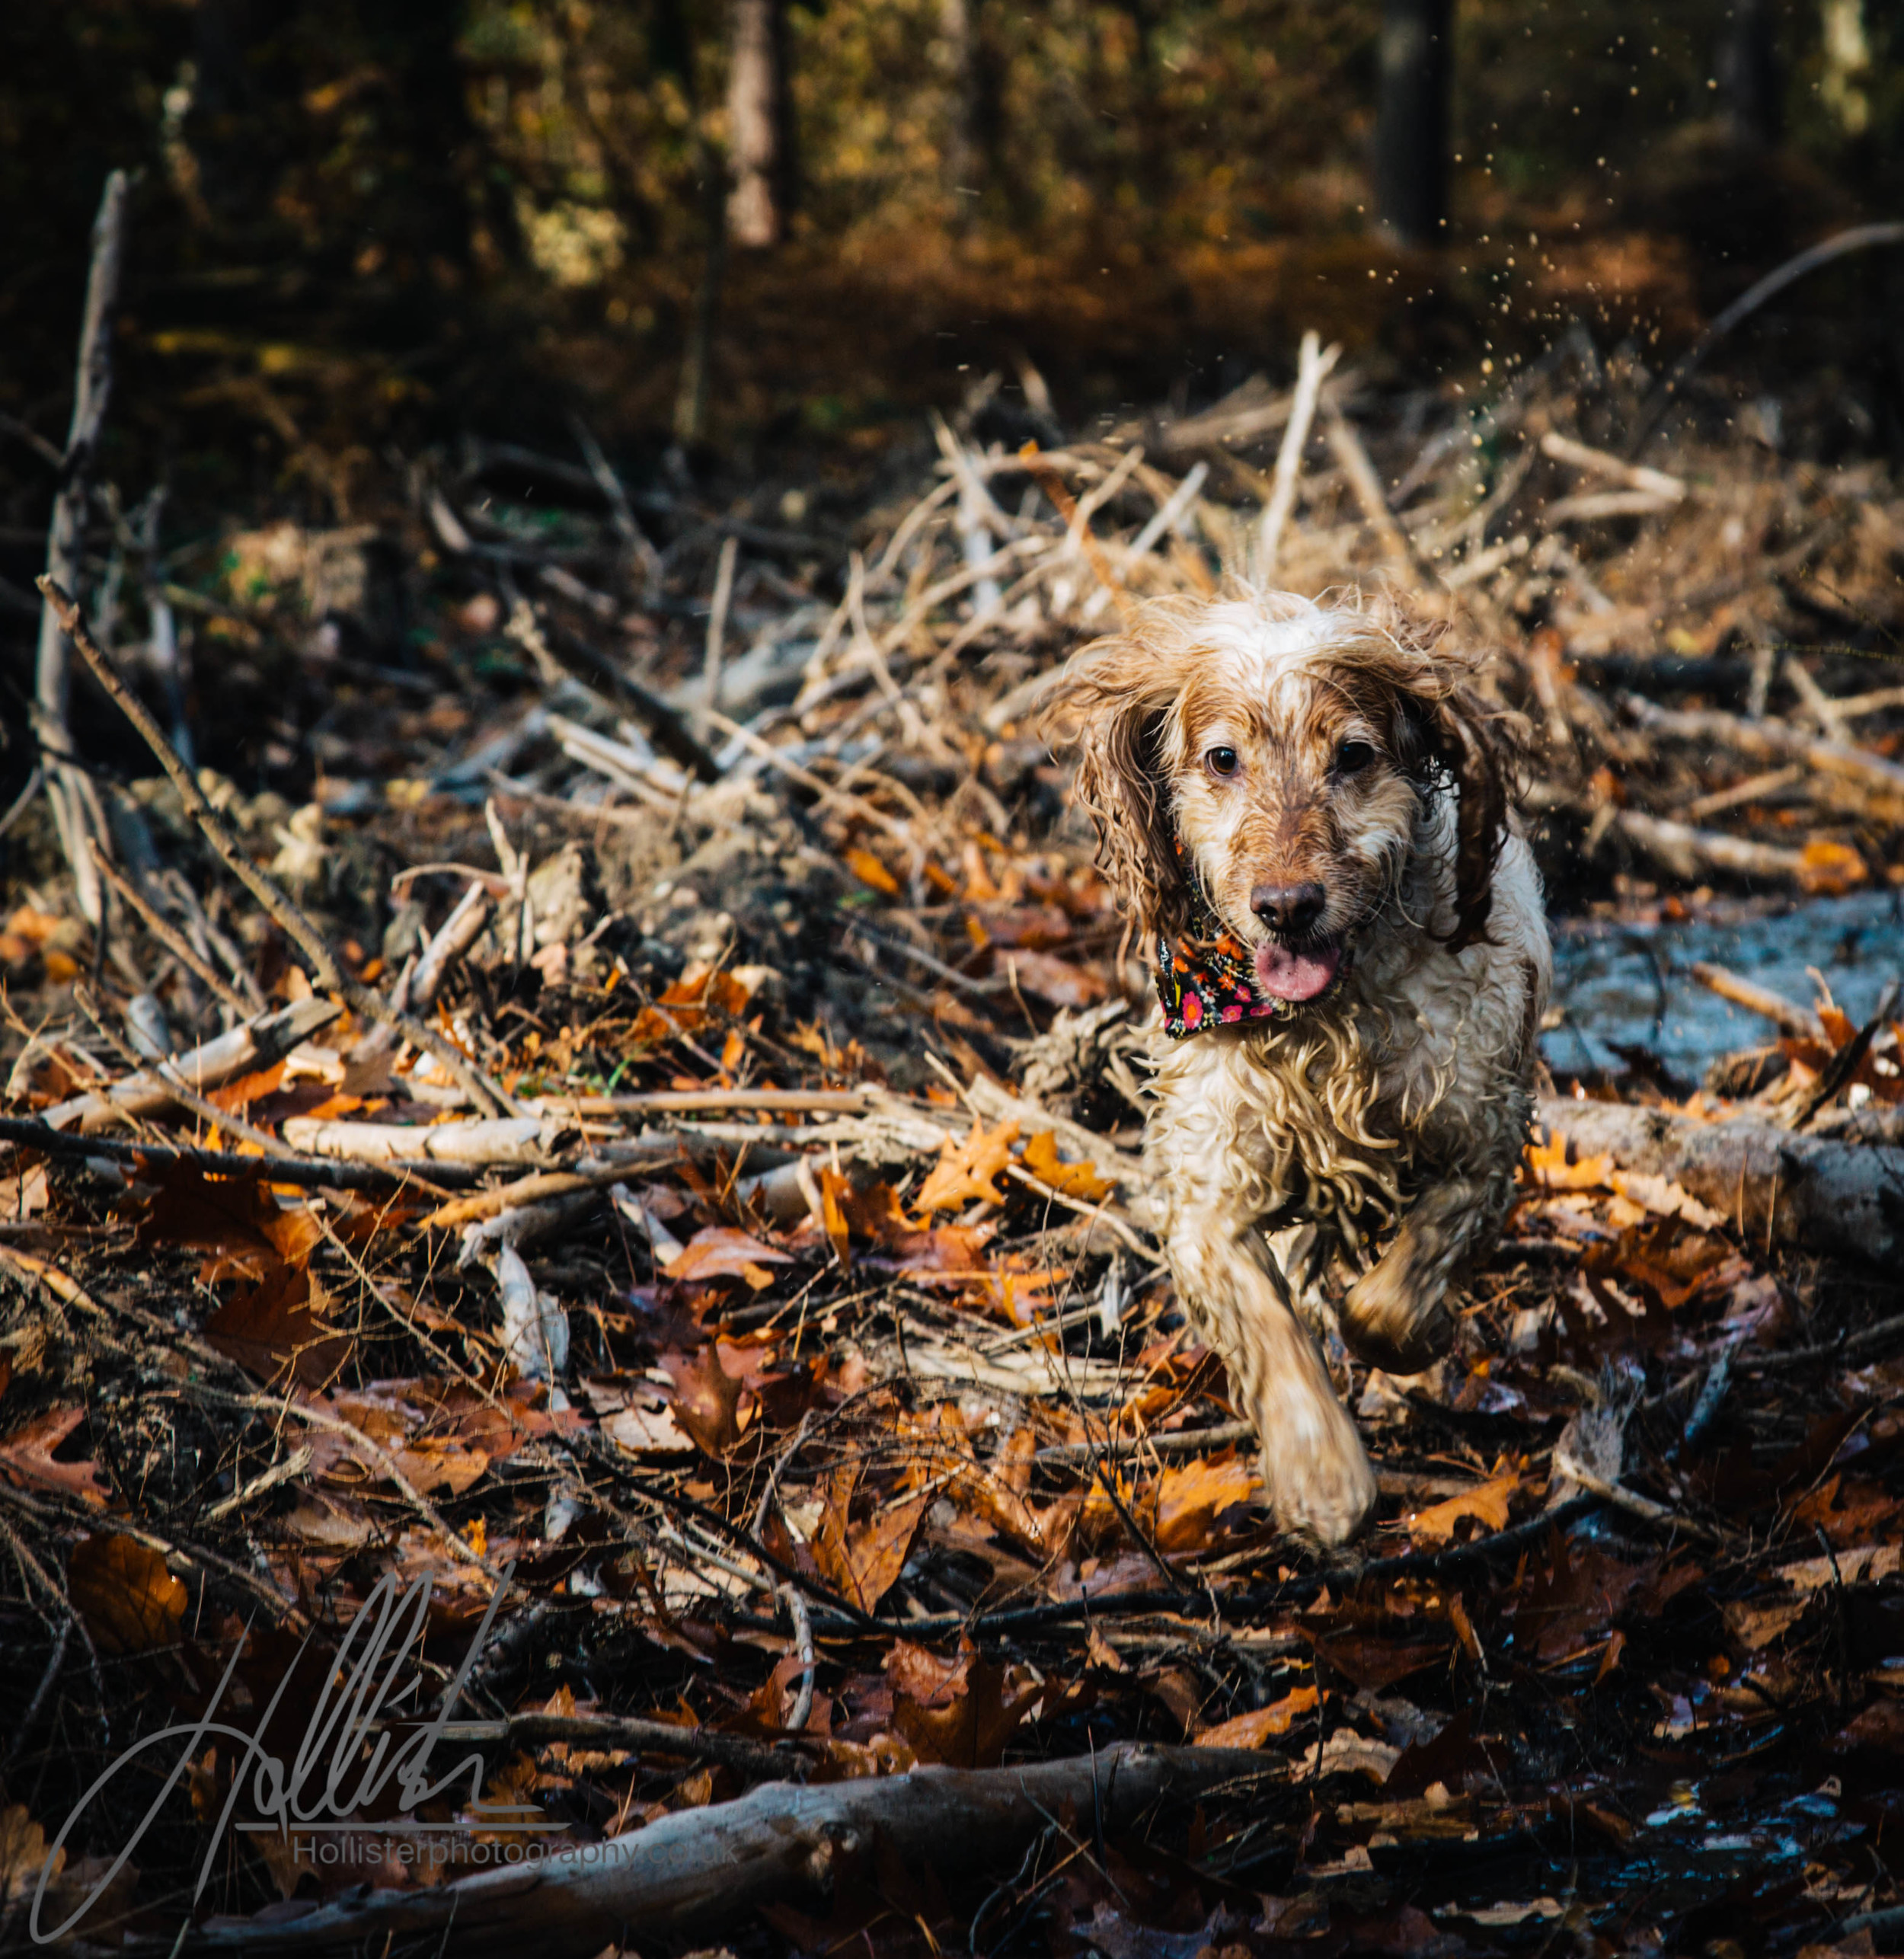 Hollisterphotography ABBY CLOWES WOOD DOG WALK-25.JPG